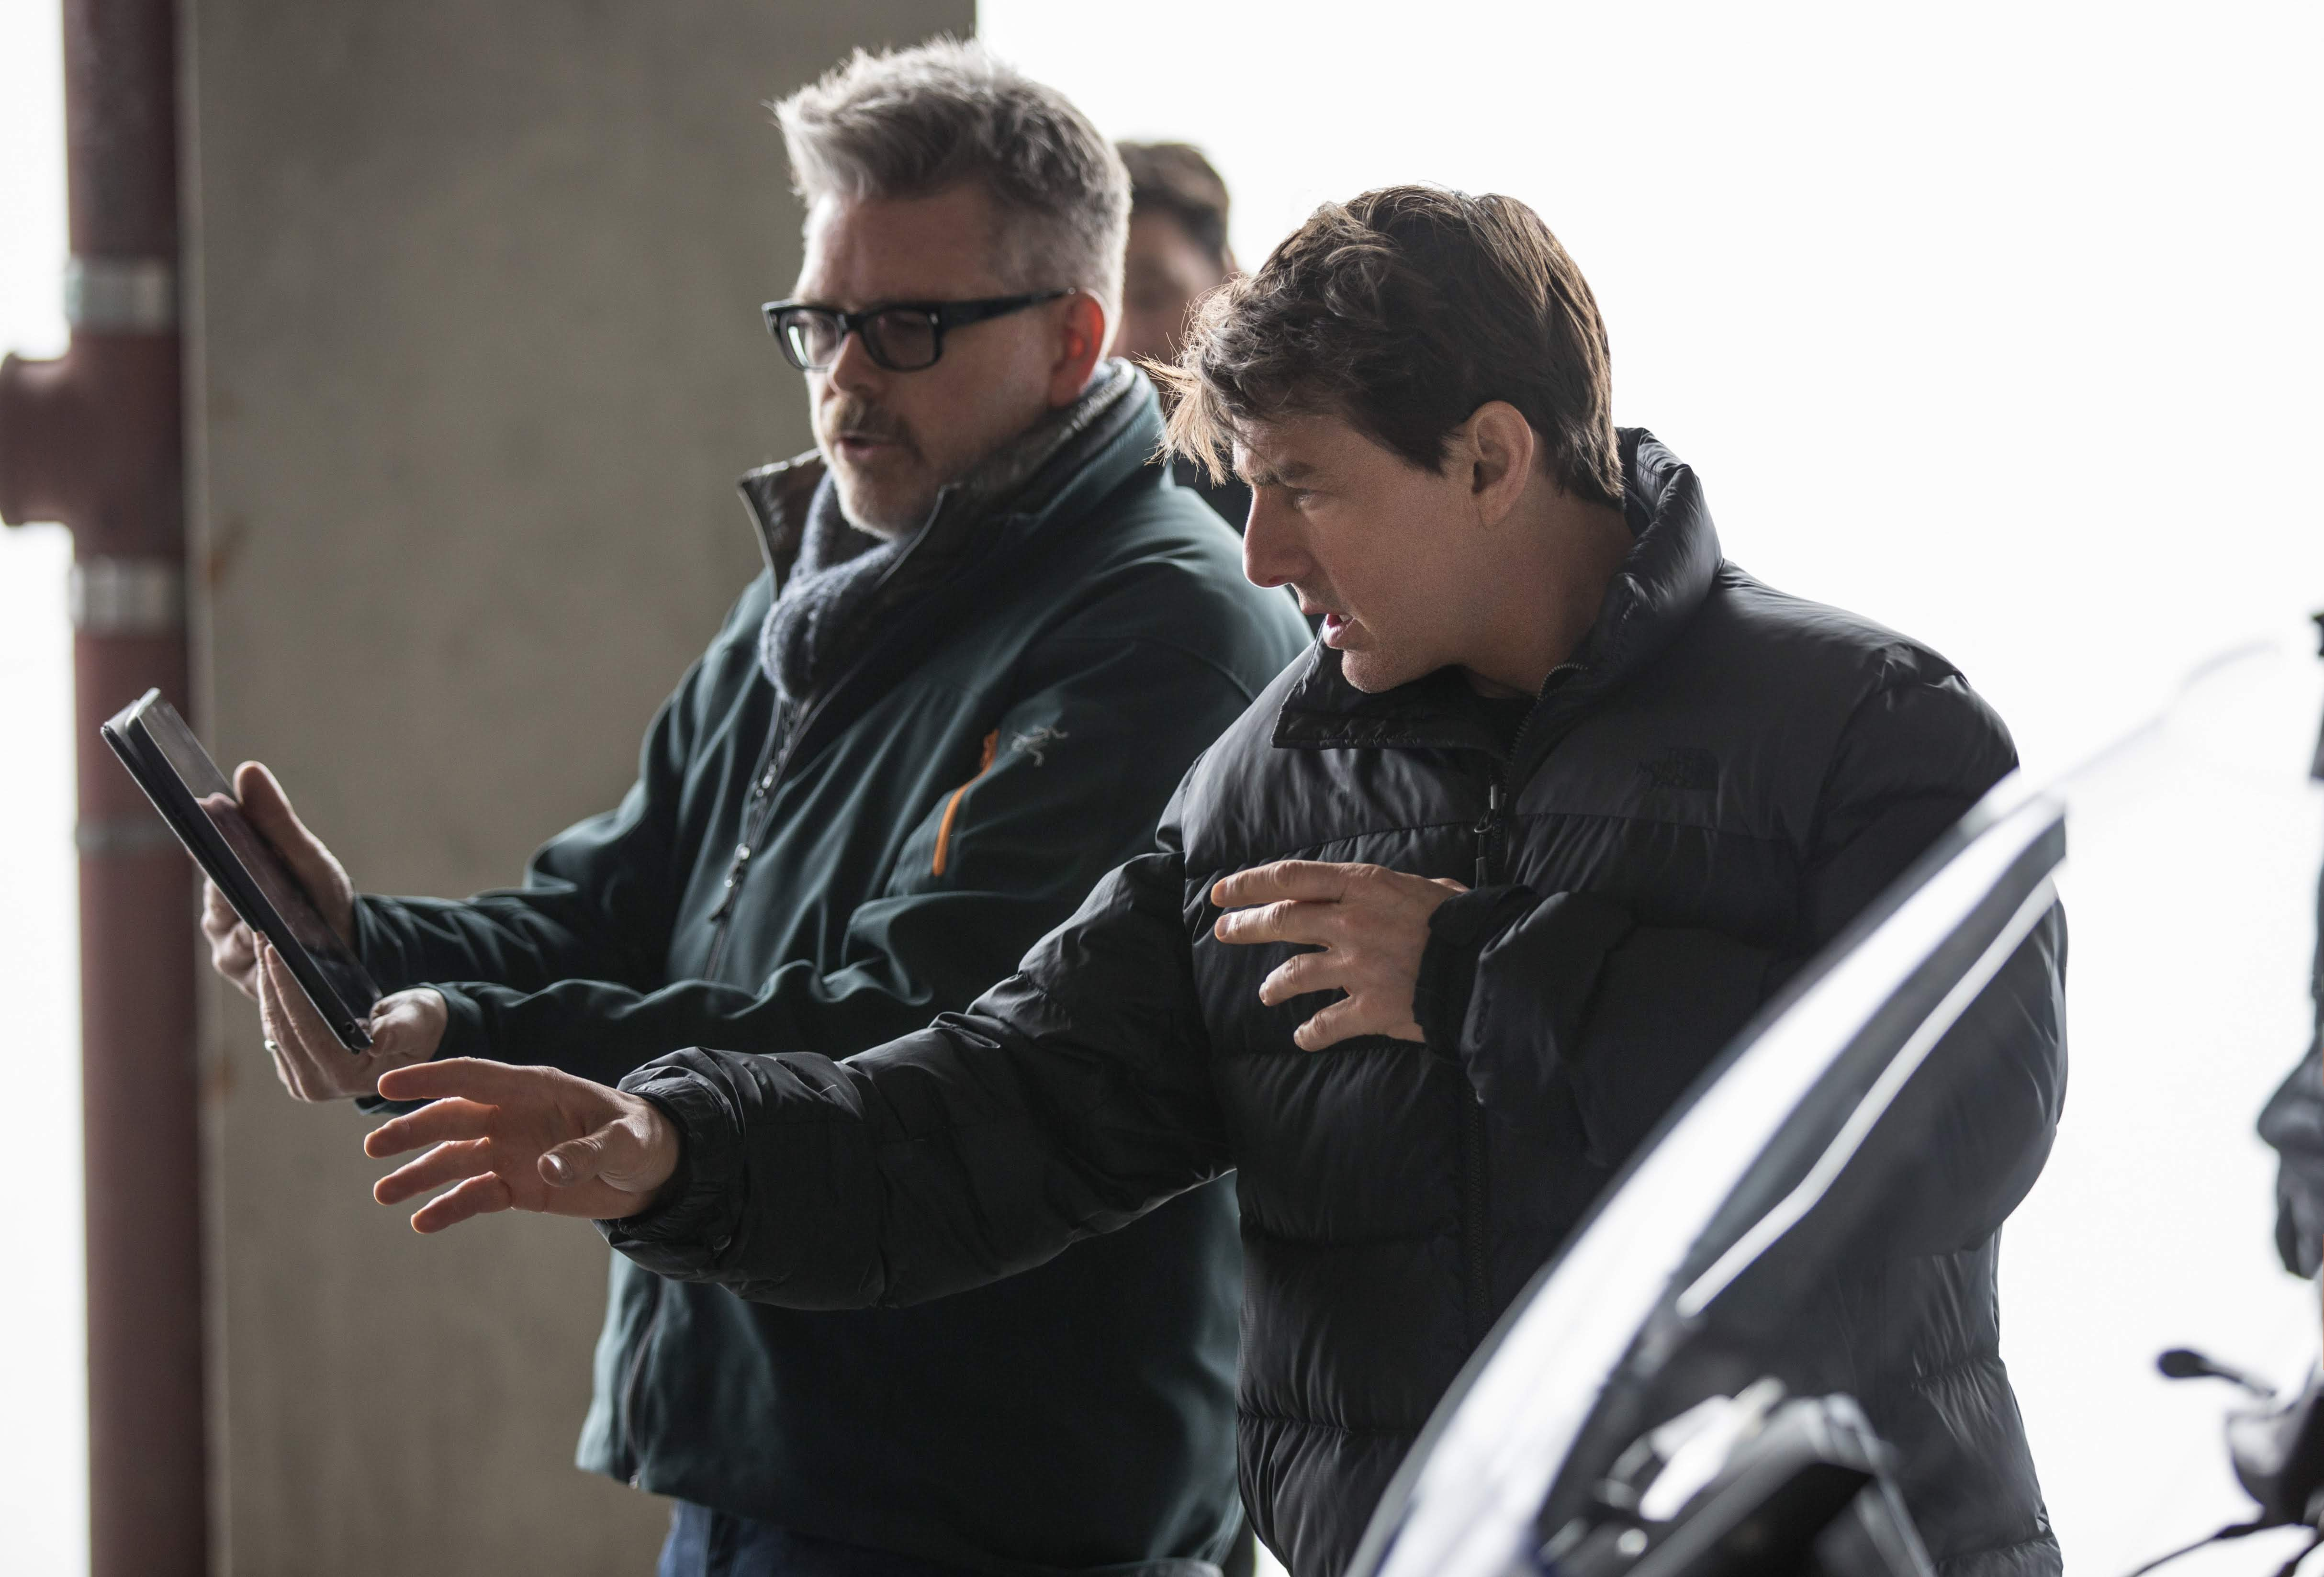 Mission: Impossible 7&8 : トム・クルーズとクリストファー・マッカリー監督のコンビが、人気スパイ・アクション映画をまさかの連発をする「ミッション : インポッシブル」の第7弾と第8弾の製作と全米公開時期が正式に決定 ! !